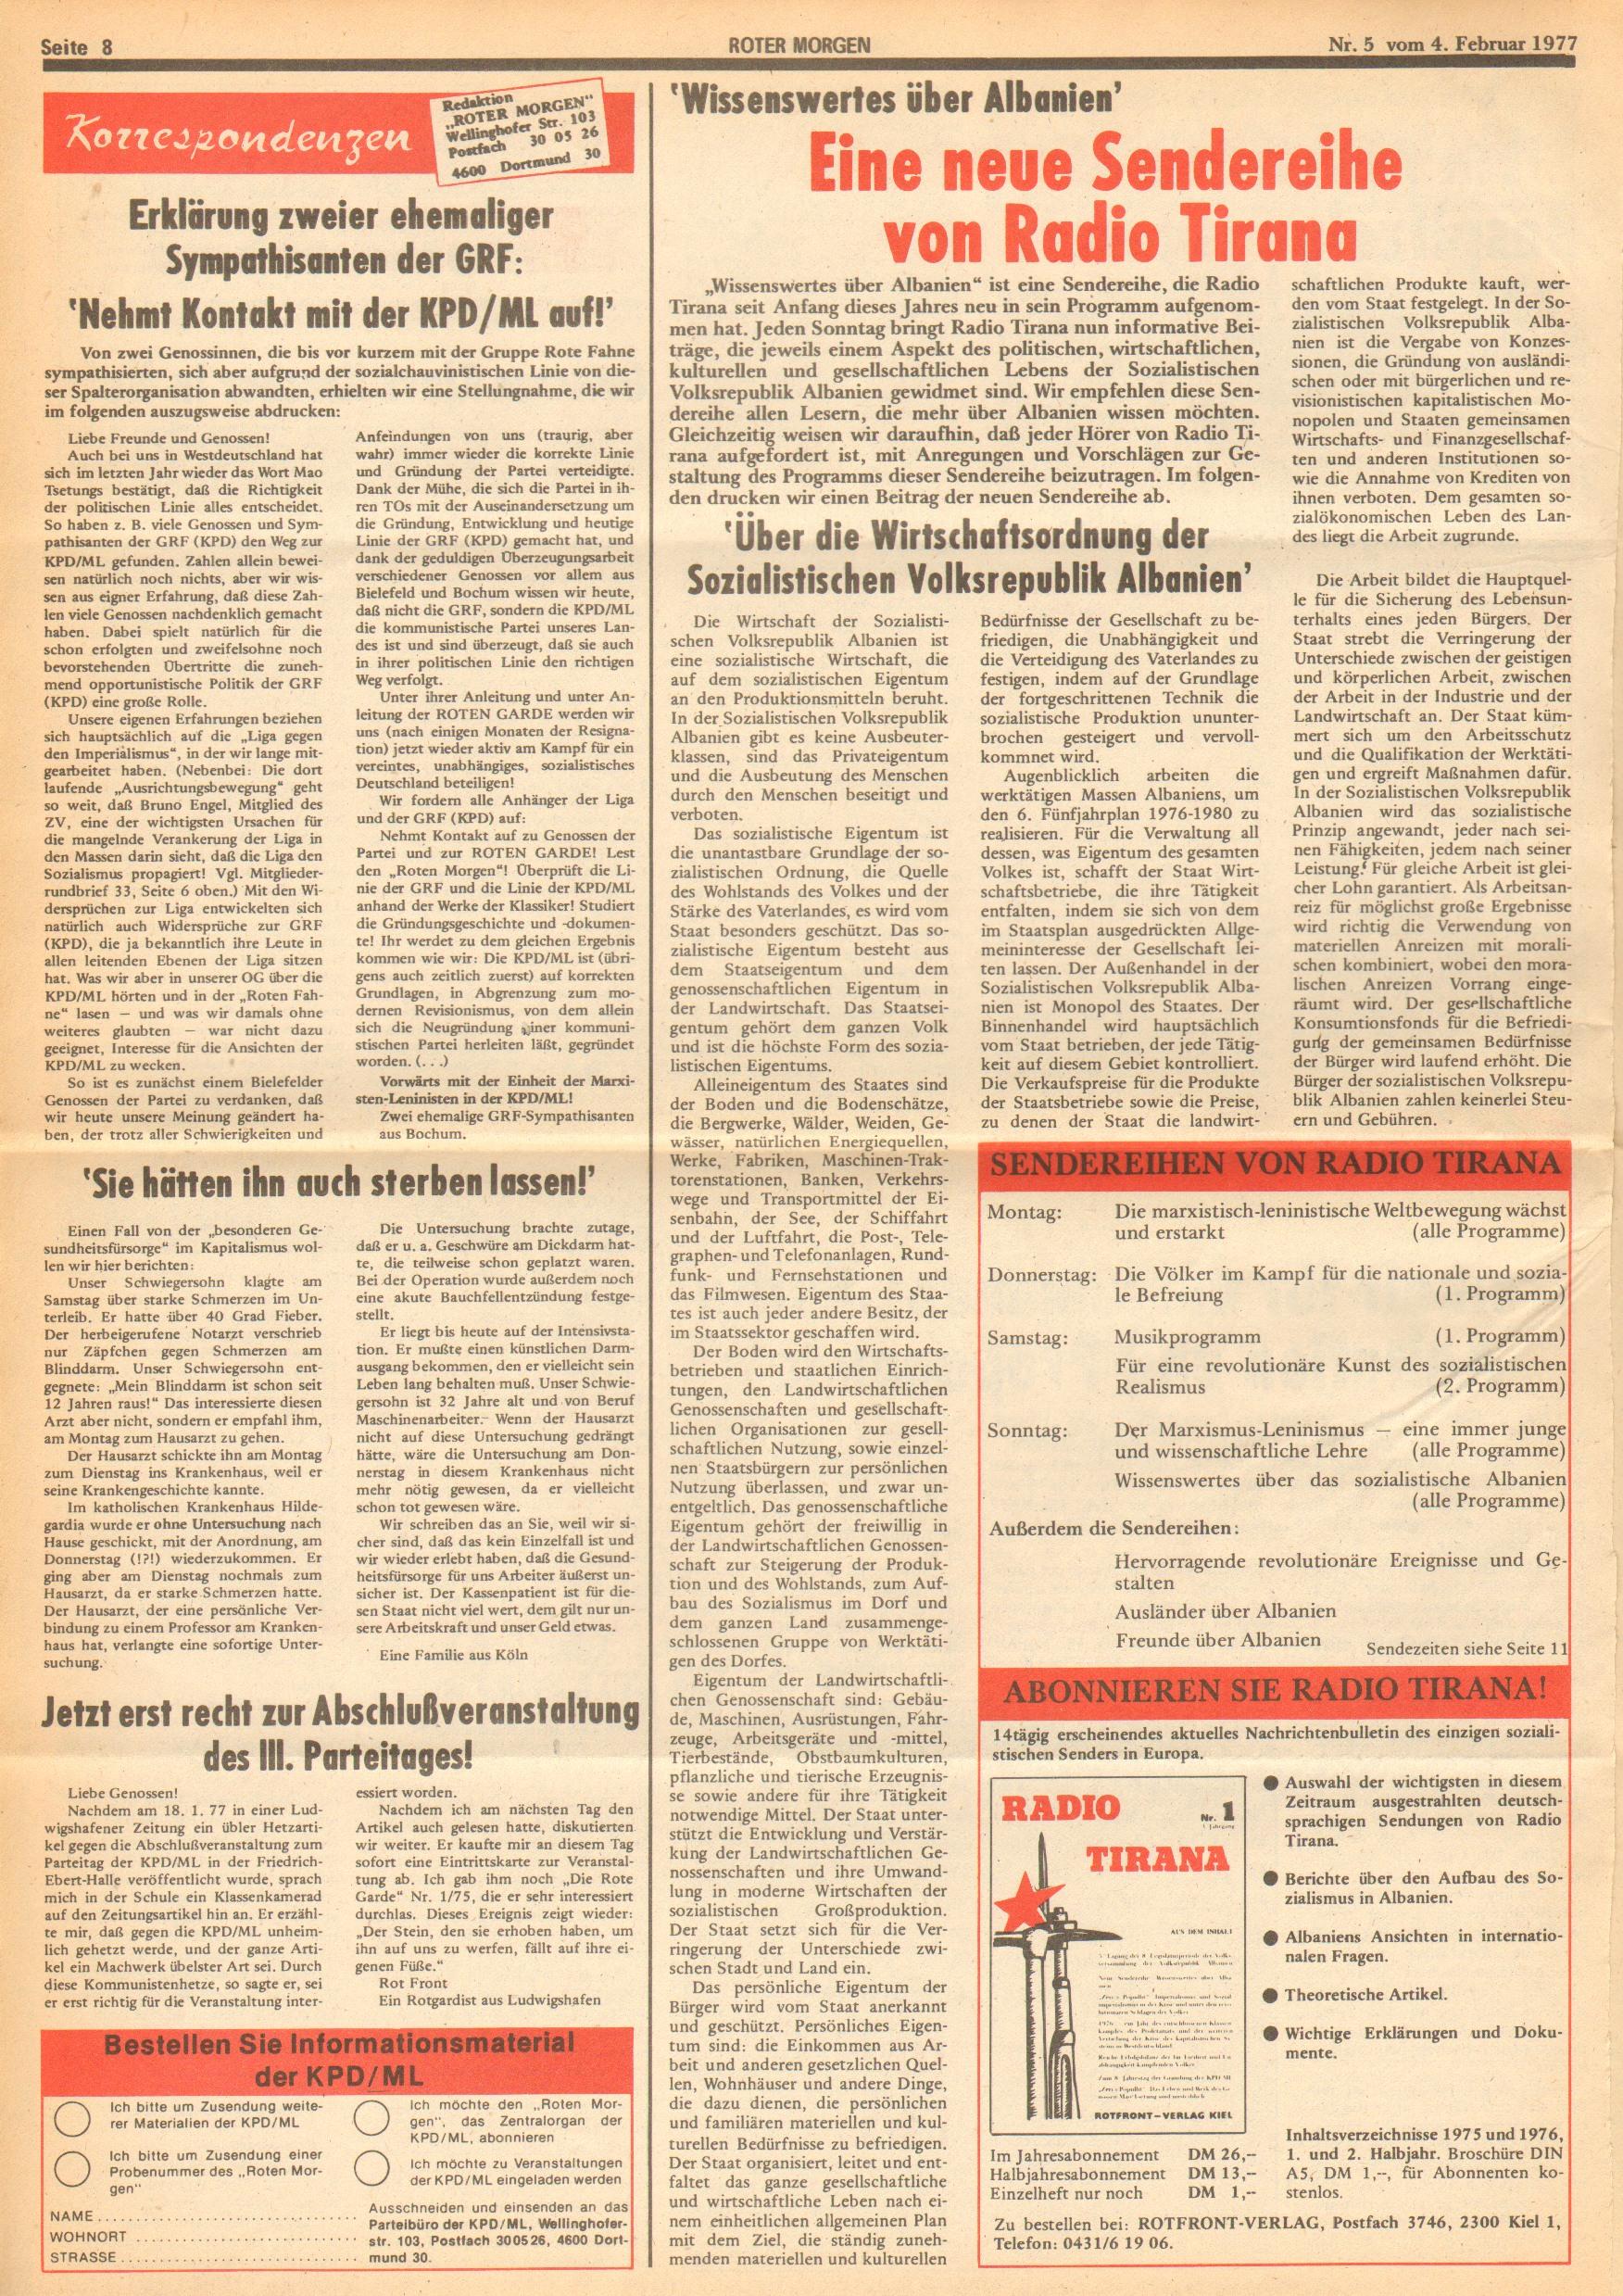 Roter Morgen, 11. Jg., 4. Februar 1977, Nr. 5, Seite 8